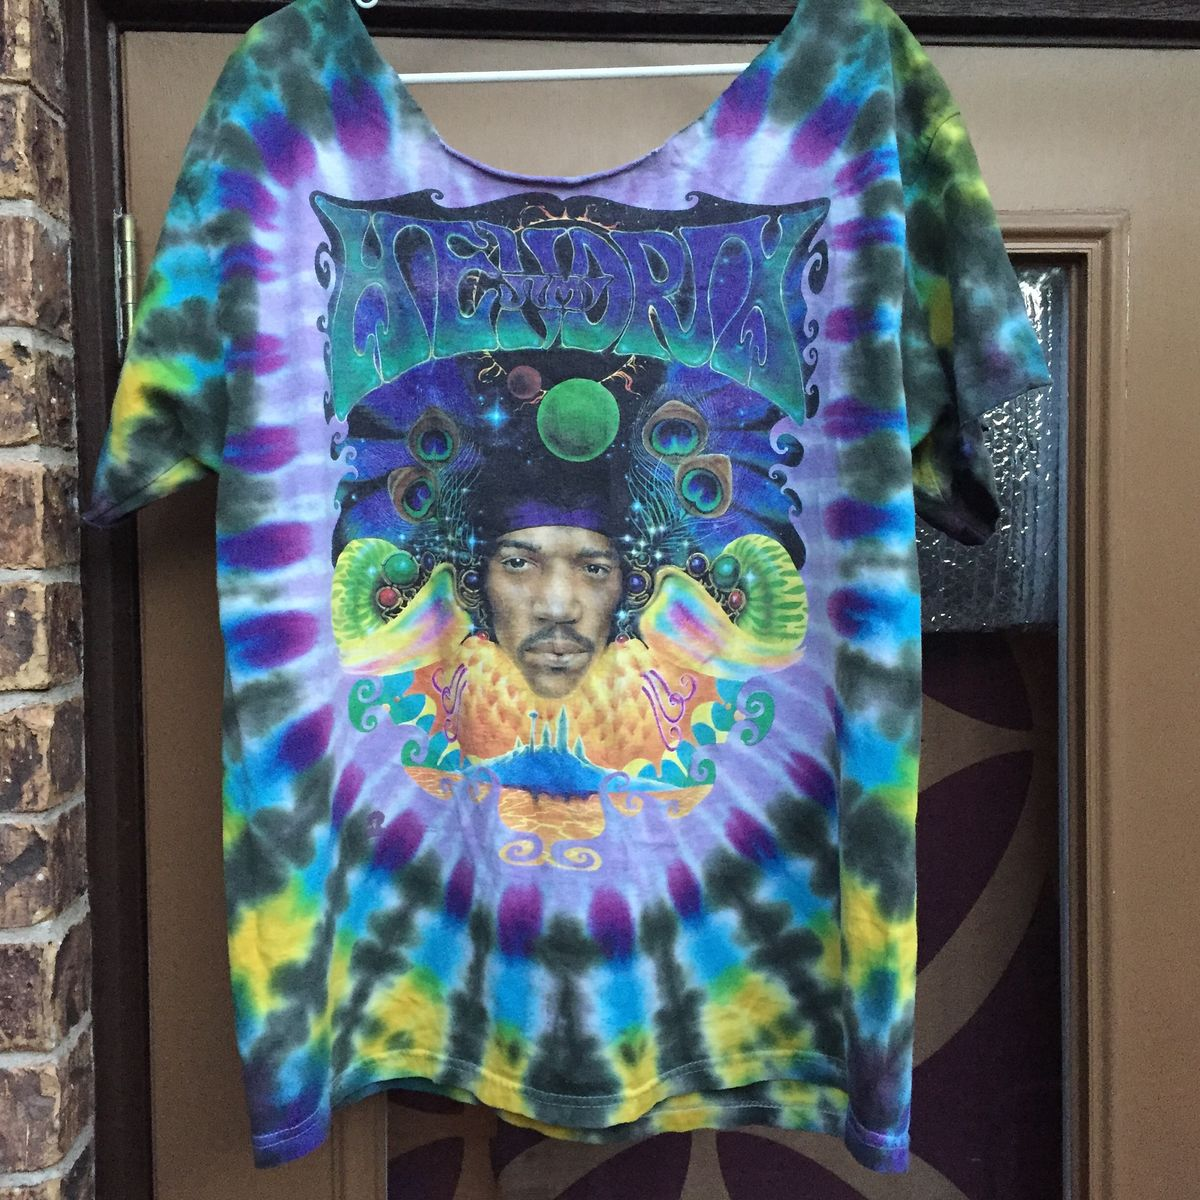 f0f93efe39c Amazing Vintage 1997 Jimi Hendrix Tie Dye - product images of ...